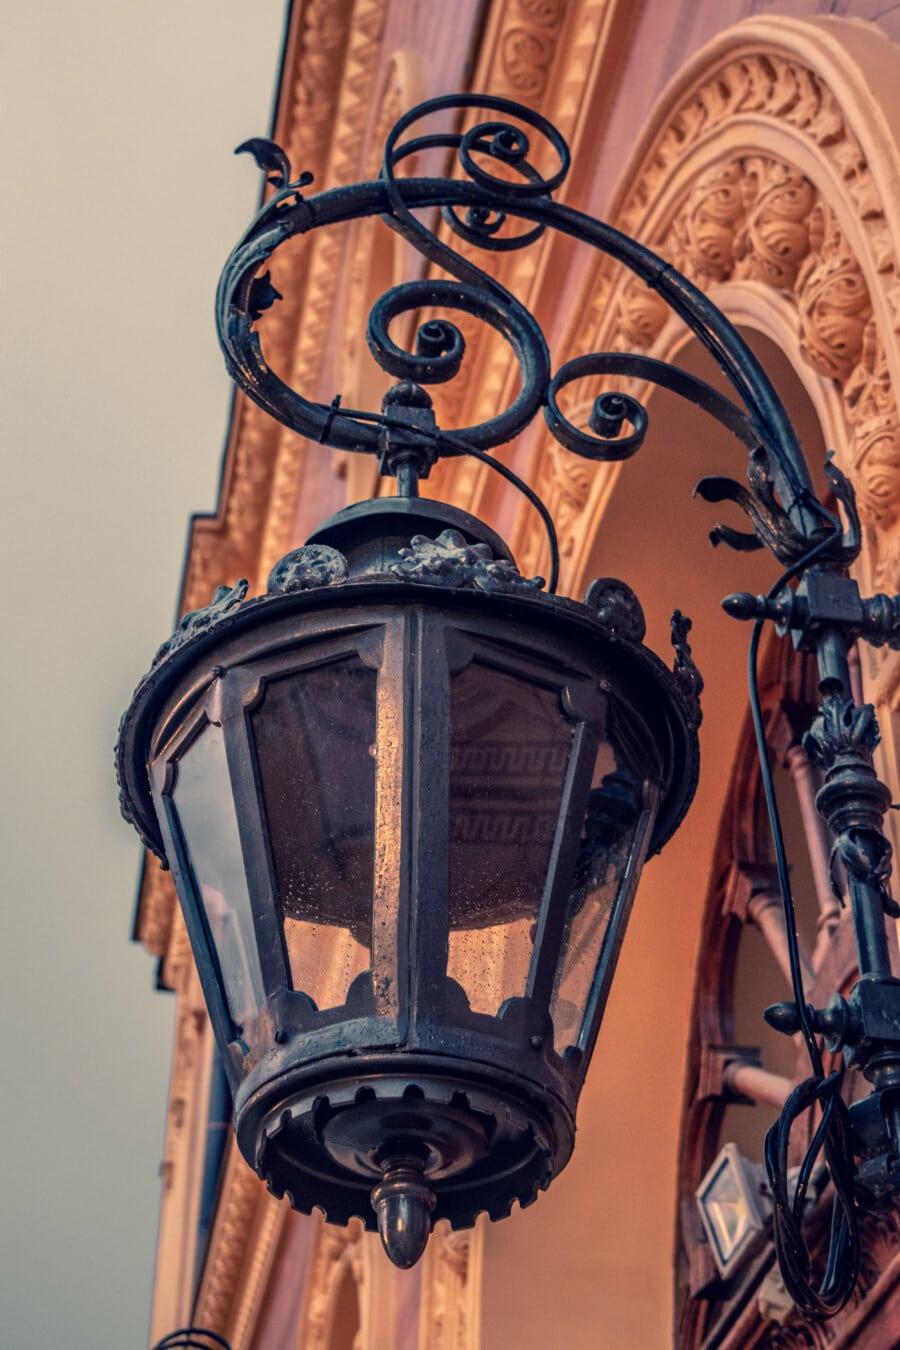 cast iron, lantern, walls, hanging, baroque, classic, handmade, vintage, antique, architecture